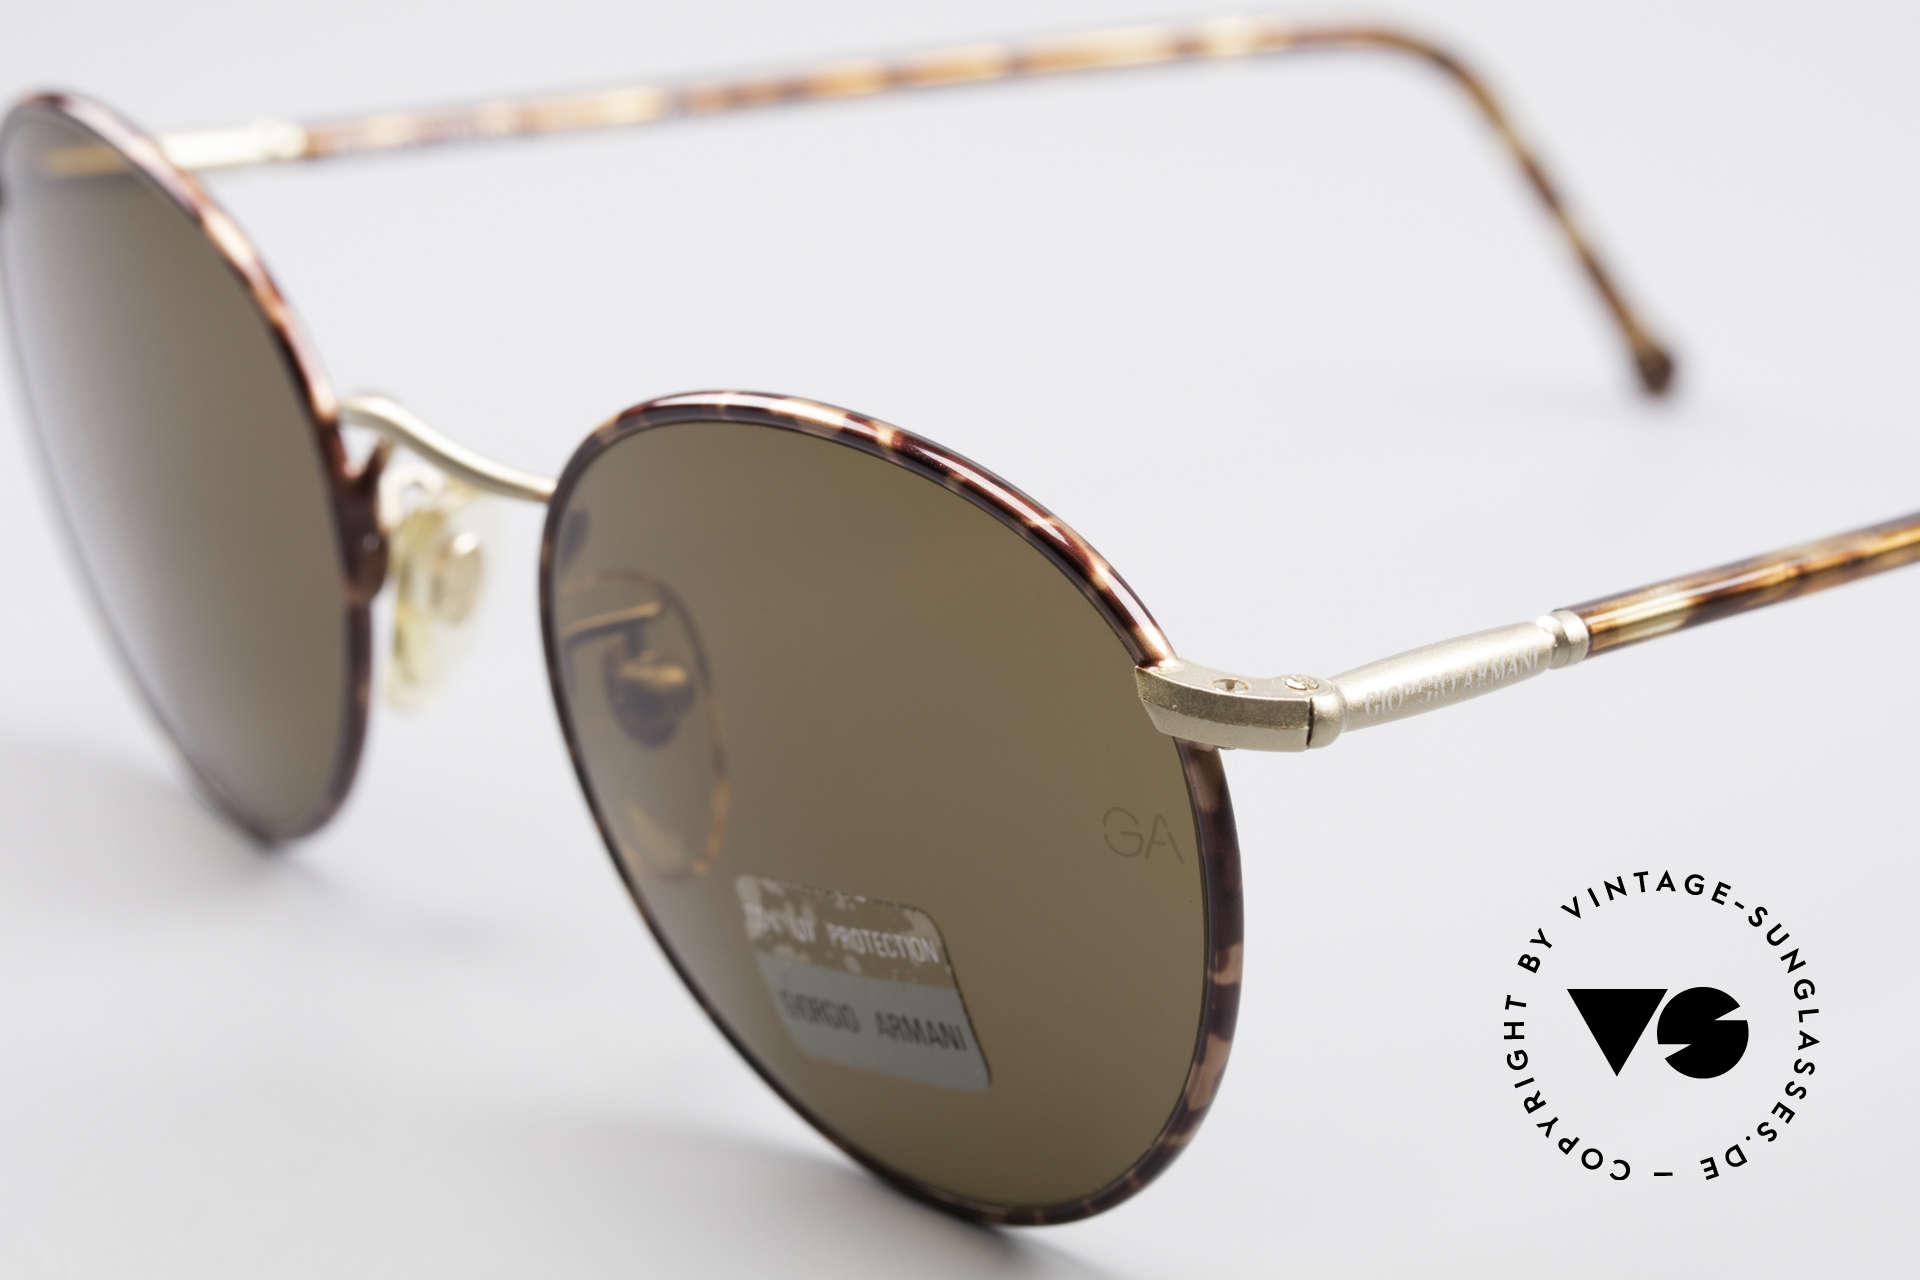 Giorgio Armani 639 No Retro Panto Sunglasses, high-end mineral lenses (100% UV) with GA engraving, Made for Men and Women